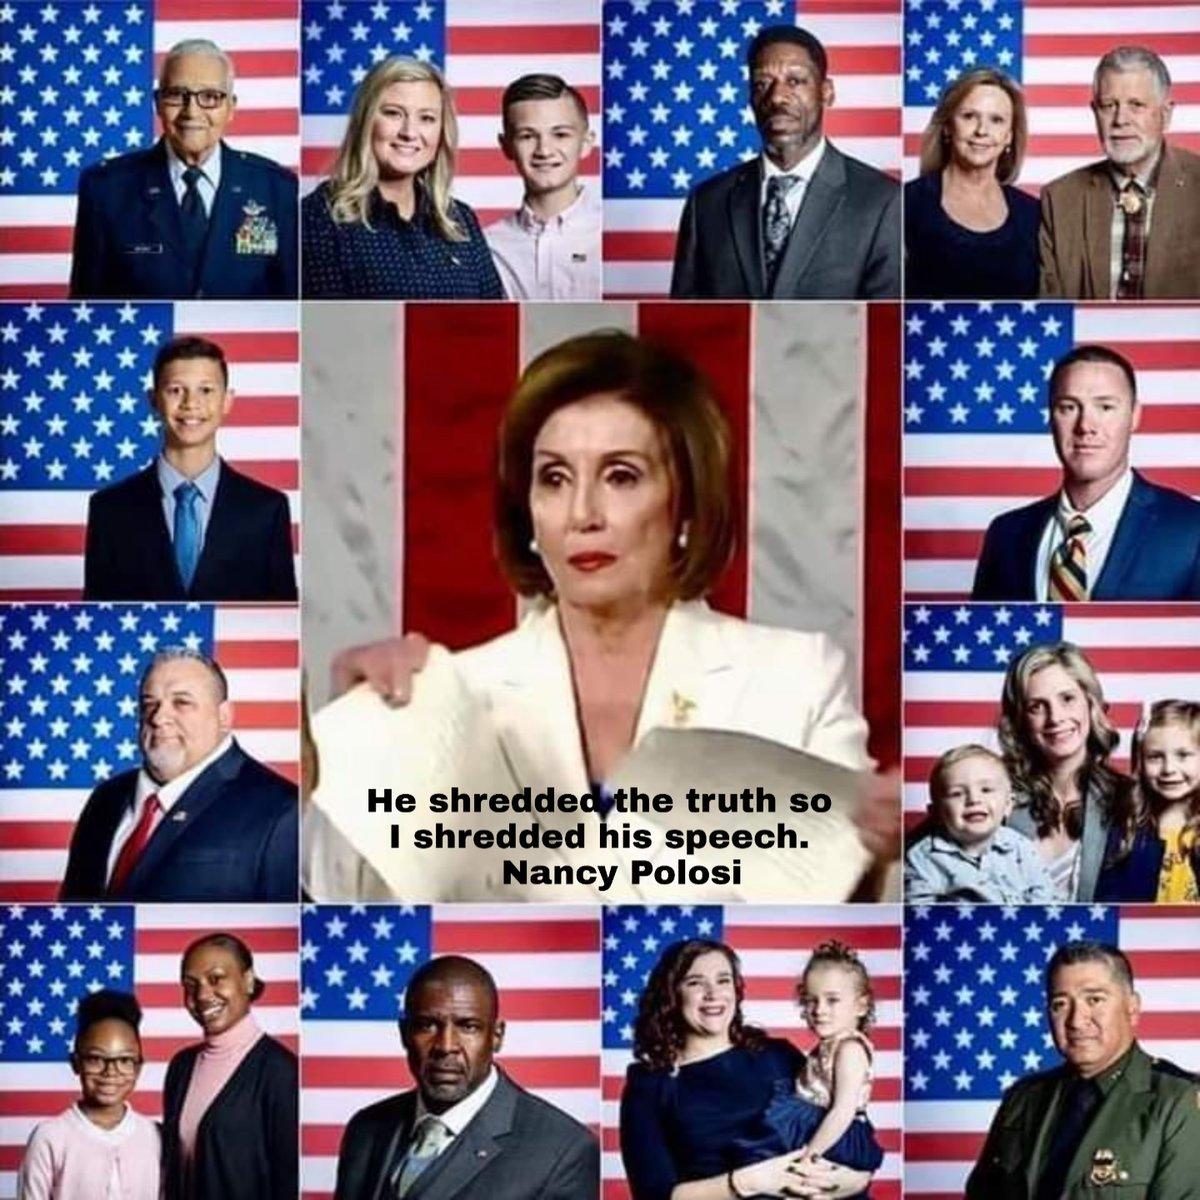 POS. @SpeakerPelosi #TRUMP2020LandsideVictory #MAGA #TrumpTrain #PatriotsUnited #AmericaFirst #TrumpArmy #TRUMPSTRONG #USA #POTUS #Trump45 #draintheswamp #VoteThemOut2018 #WalkAway #BlacksForTrump #LatinosForTrump #EvangelicalsForTrump #WomenForTrump #TrumpPence2020 https://t.co/0IRn3M8r8v